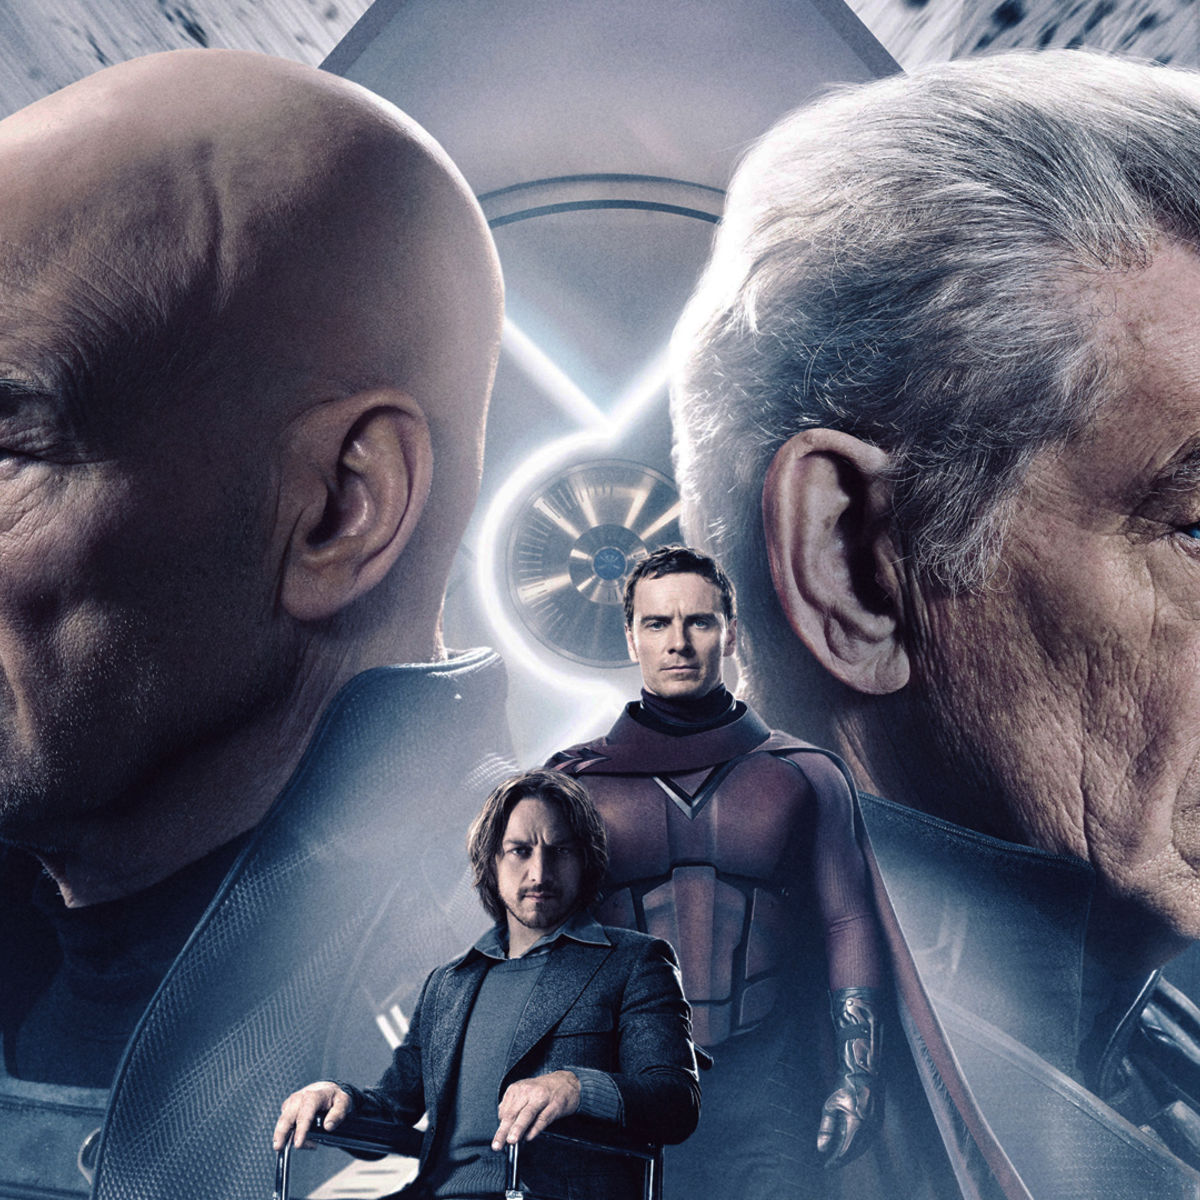 x-men-days-of-future-past-professor-x-magneto-1.jpg